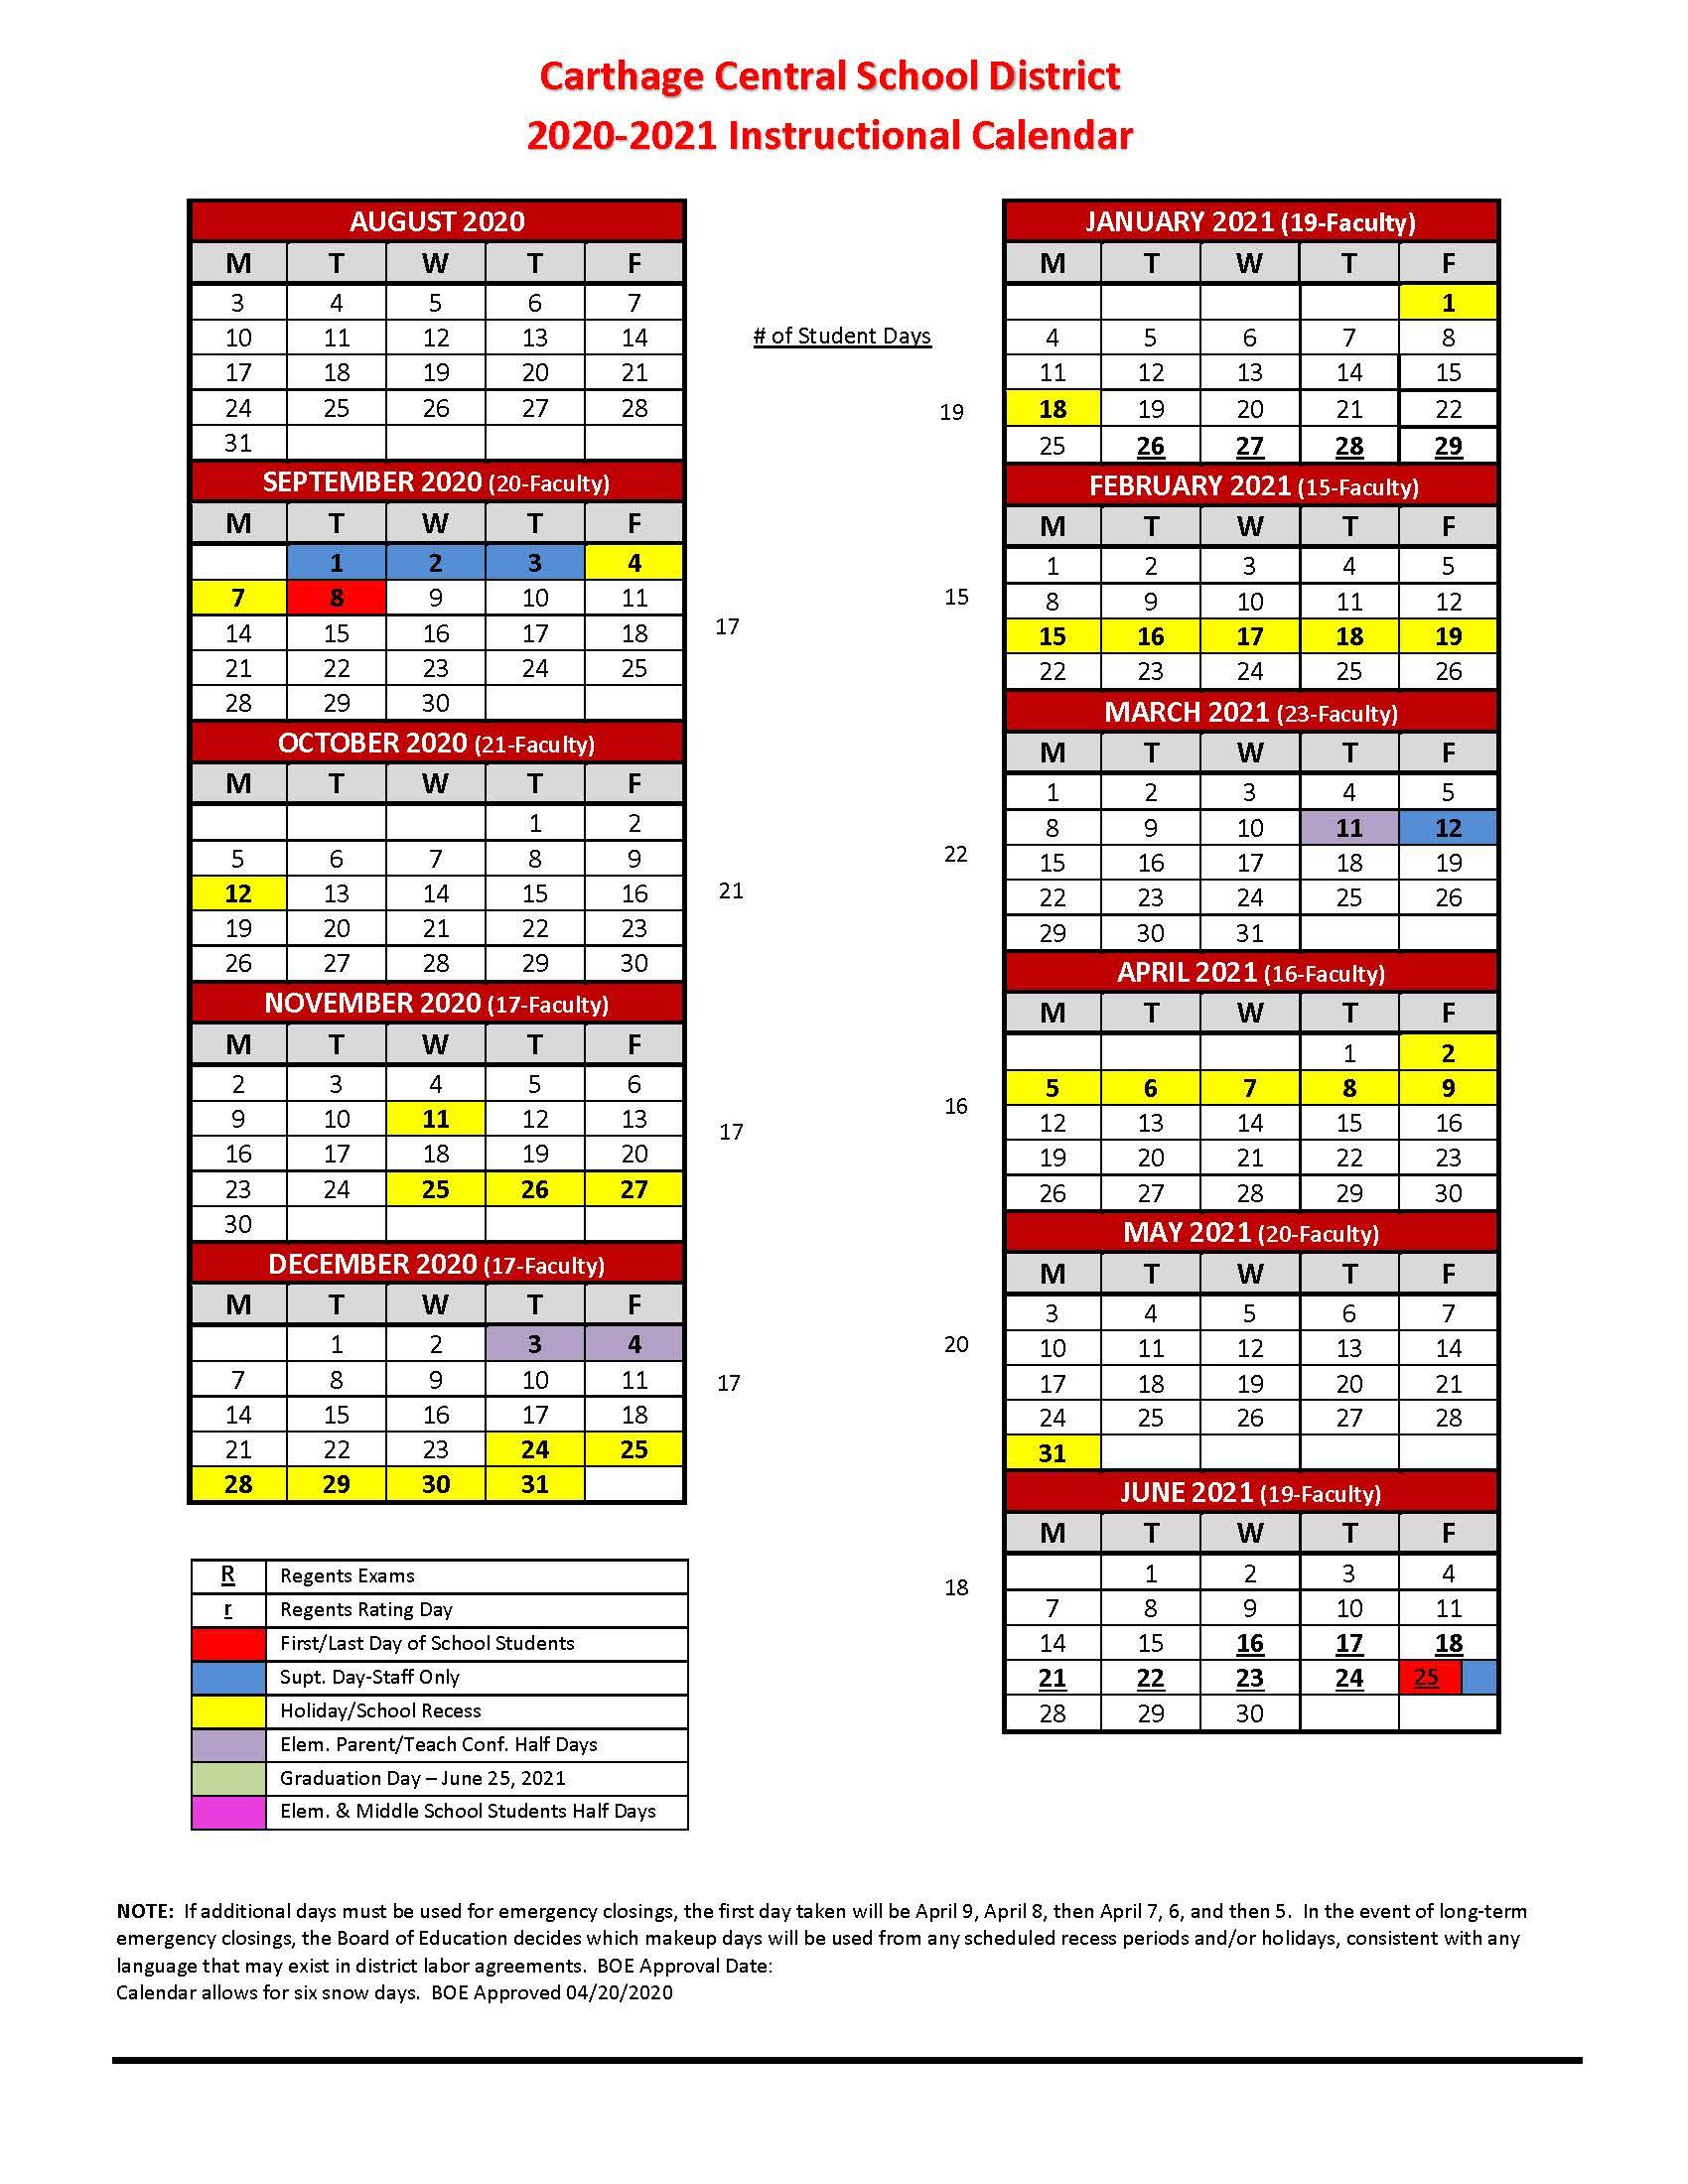 2020 2021 Instructional Calendar – Carthage Central School Inside Smithtown School Calendar 2021 20